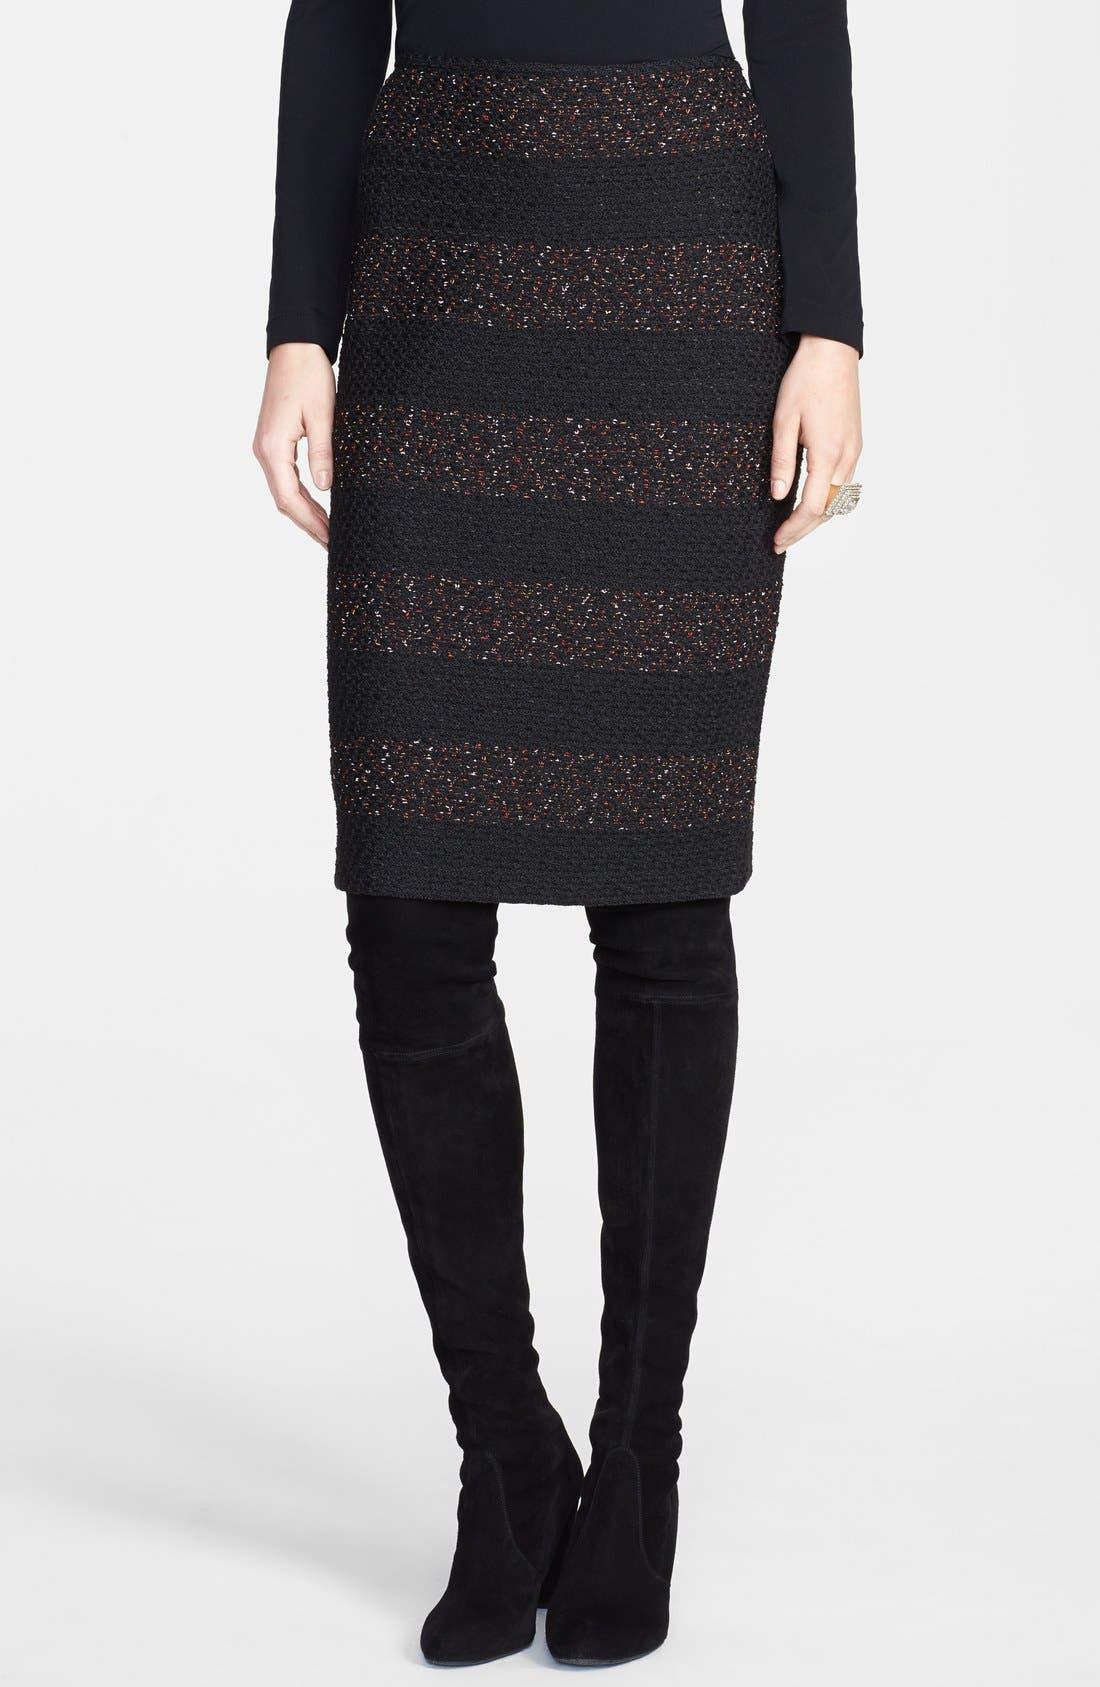 Main Image - St. John Collection Textured Fleck Knit Pencil Skirt